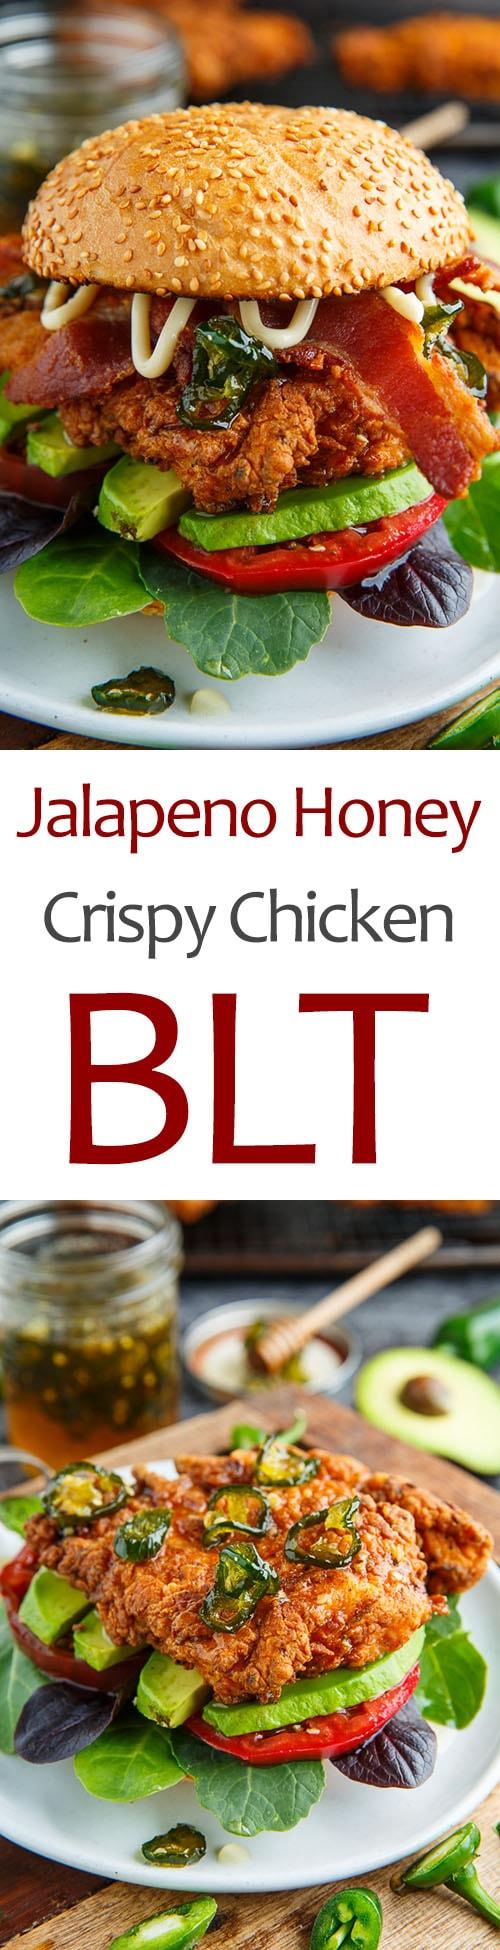 Jalapeno Honey Crispy Fried Chicken BLT